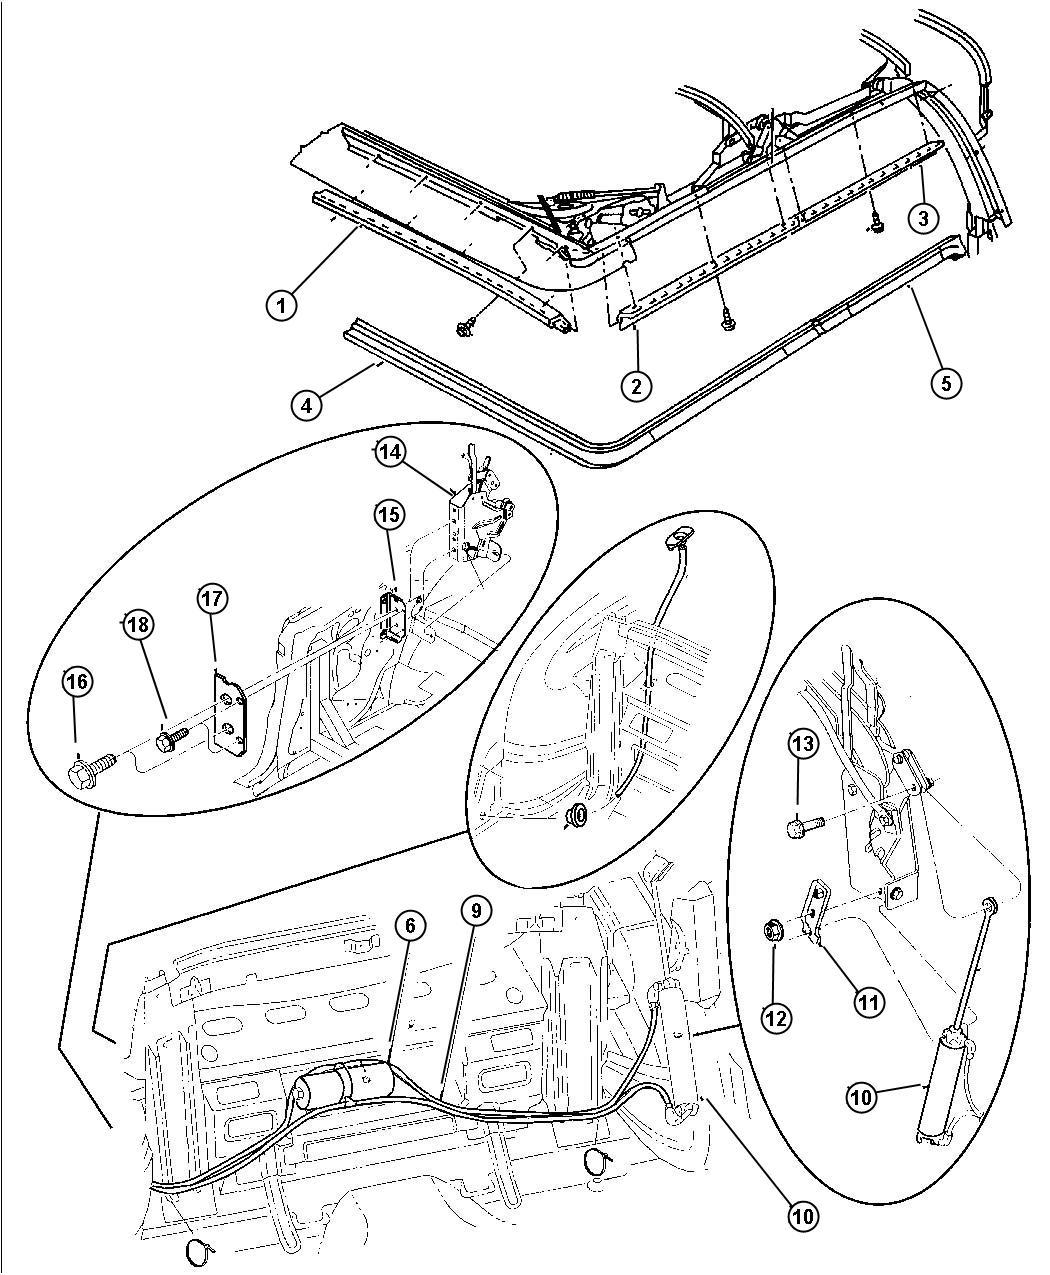 2000 Chrysler Sebring Convertible Motor And Weatherstrip.